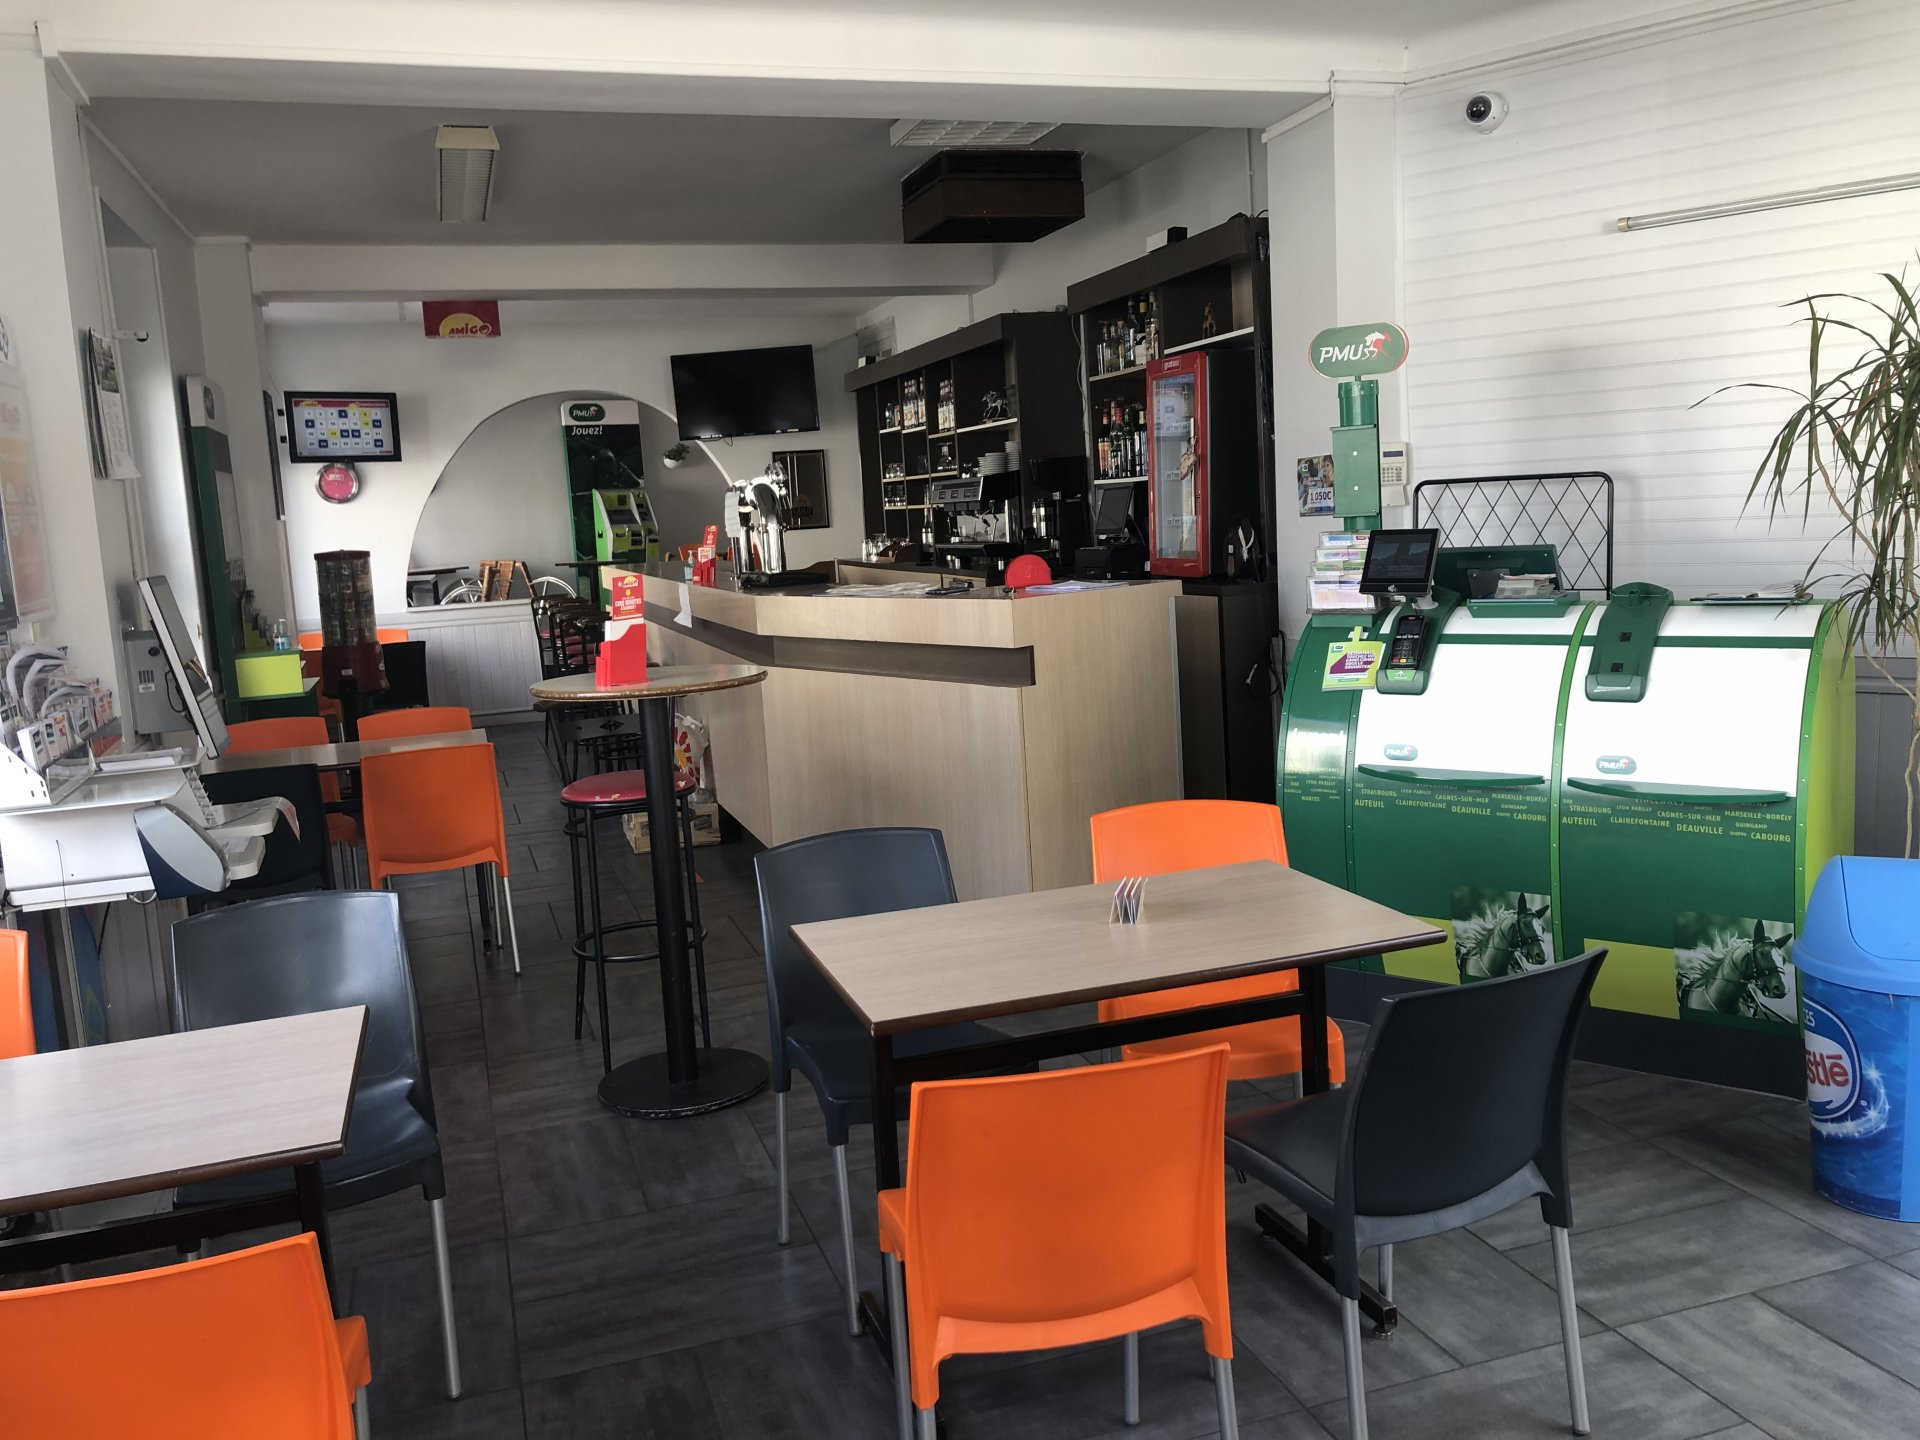 6050LRC- Fds Commerce Bar, PMU, Loto, Snack,